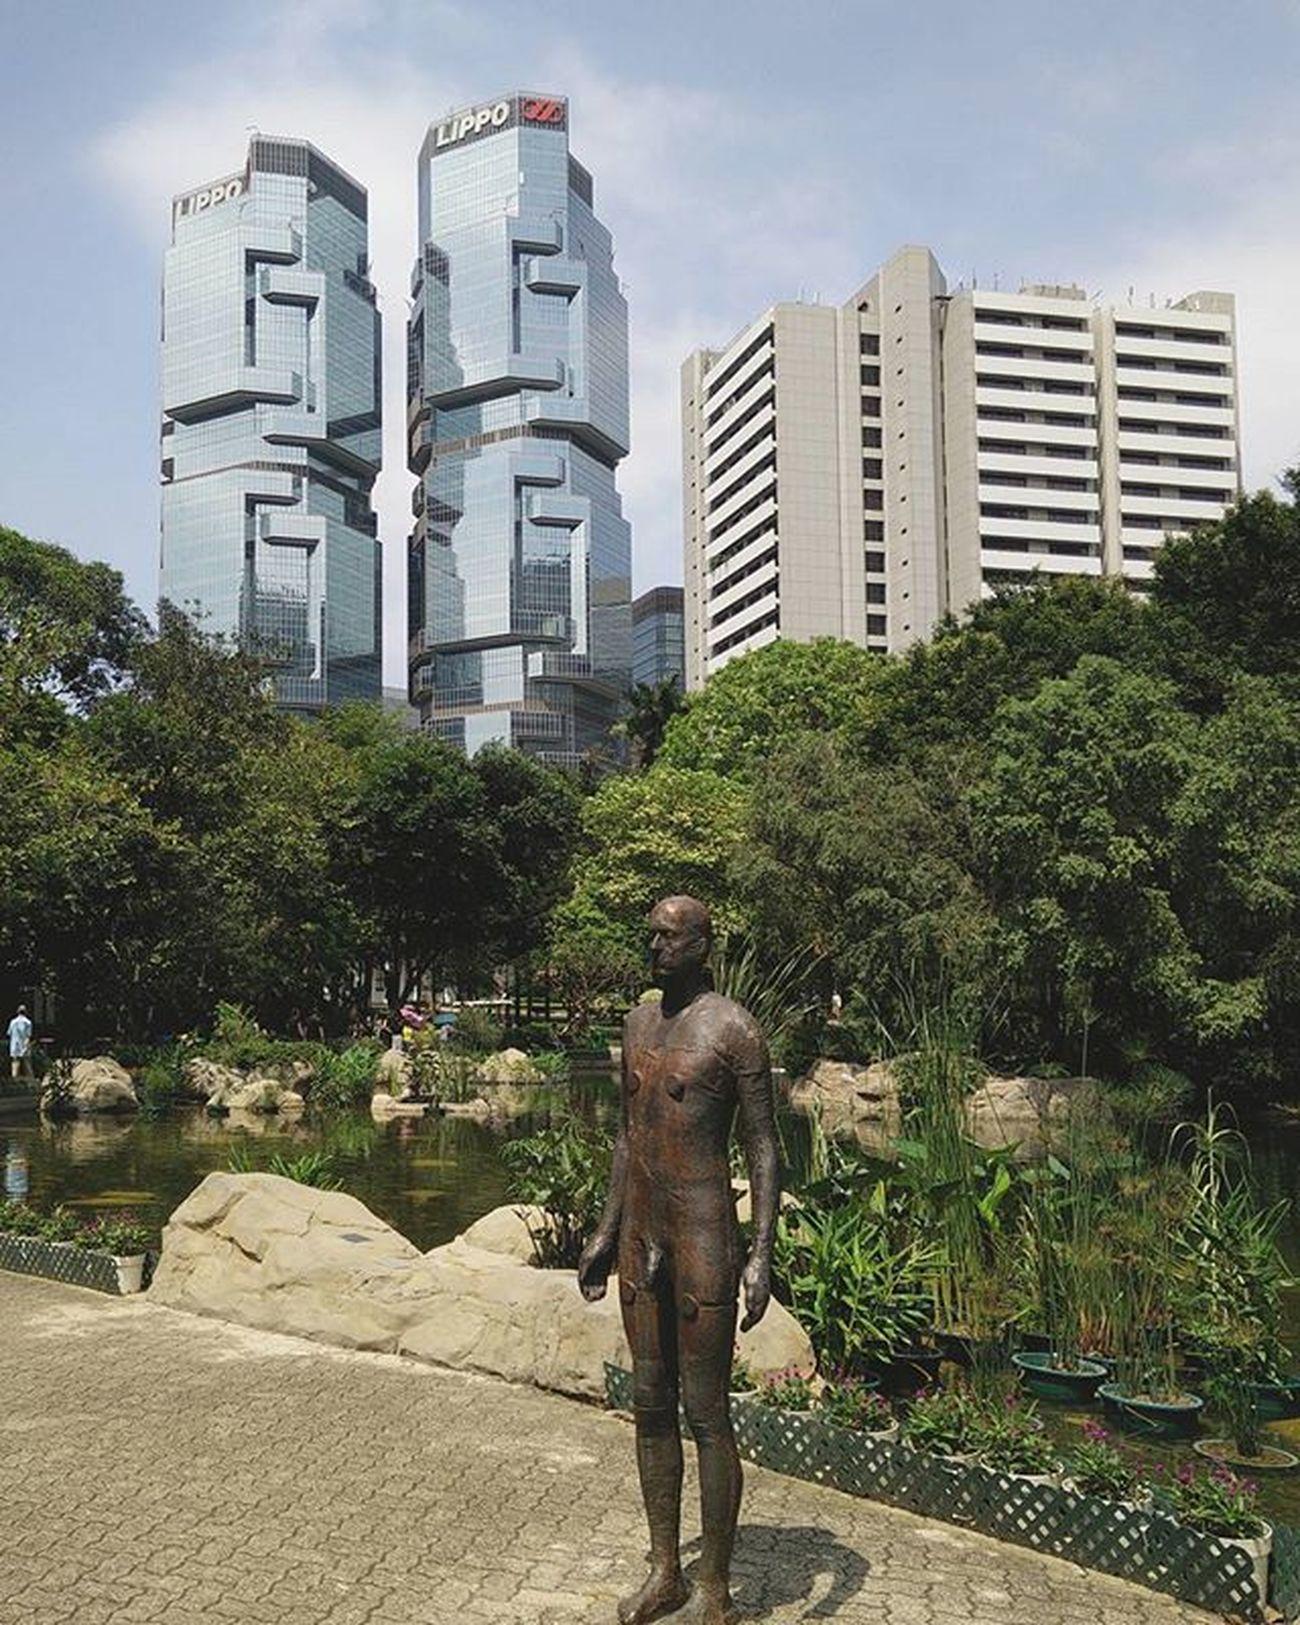 "💀🌝🌚 ""What on earth did I DRINK last night?"" ------ ------ ------ Statue Sculpture Eventhorizon AntonyGormley Buildings Greenery Hongkongpark Central Hkig Instameethk Oneplusone Art Photography Discoverhongkong EyeEm Urbanexploration"